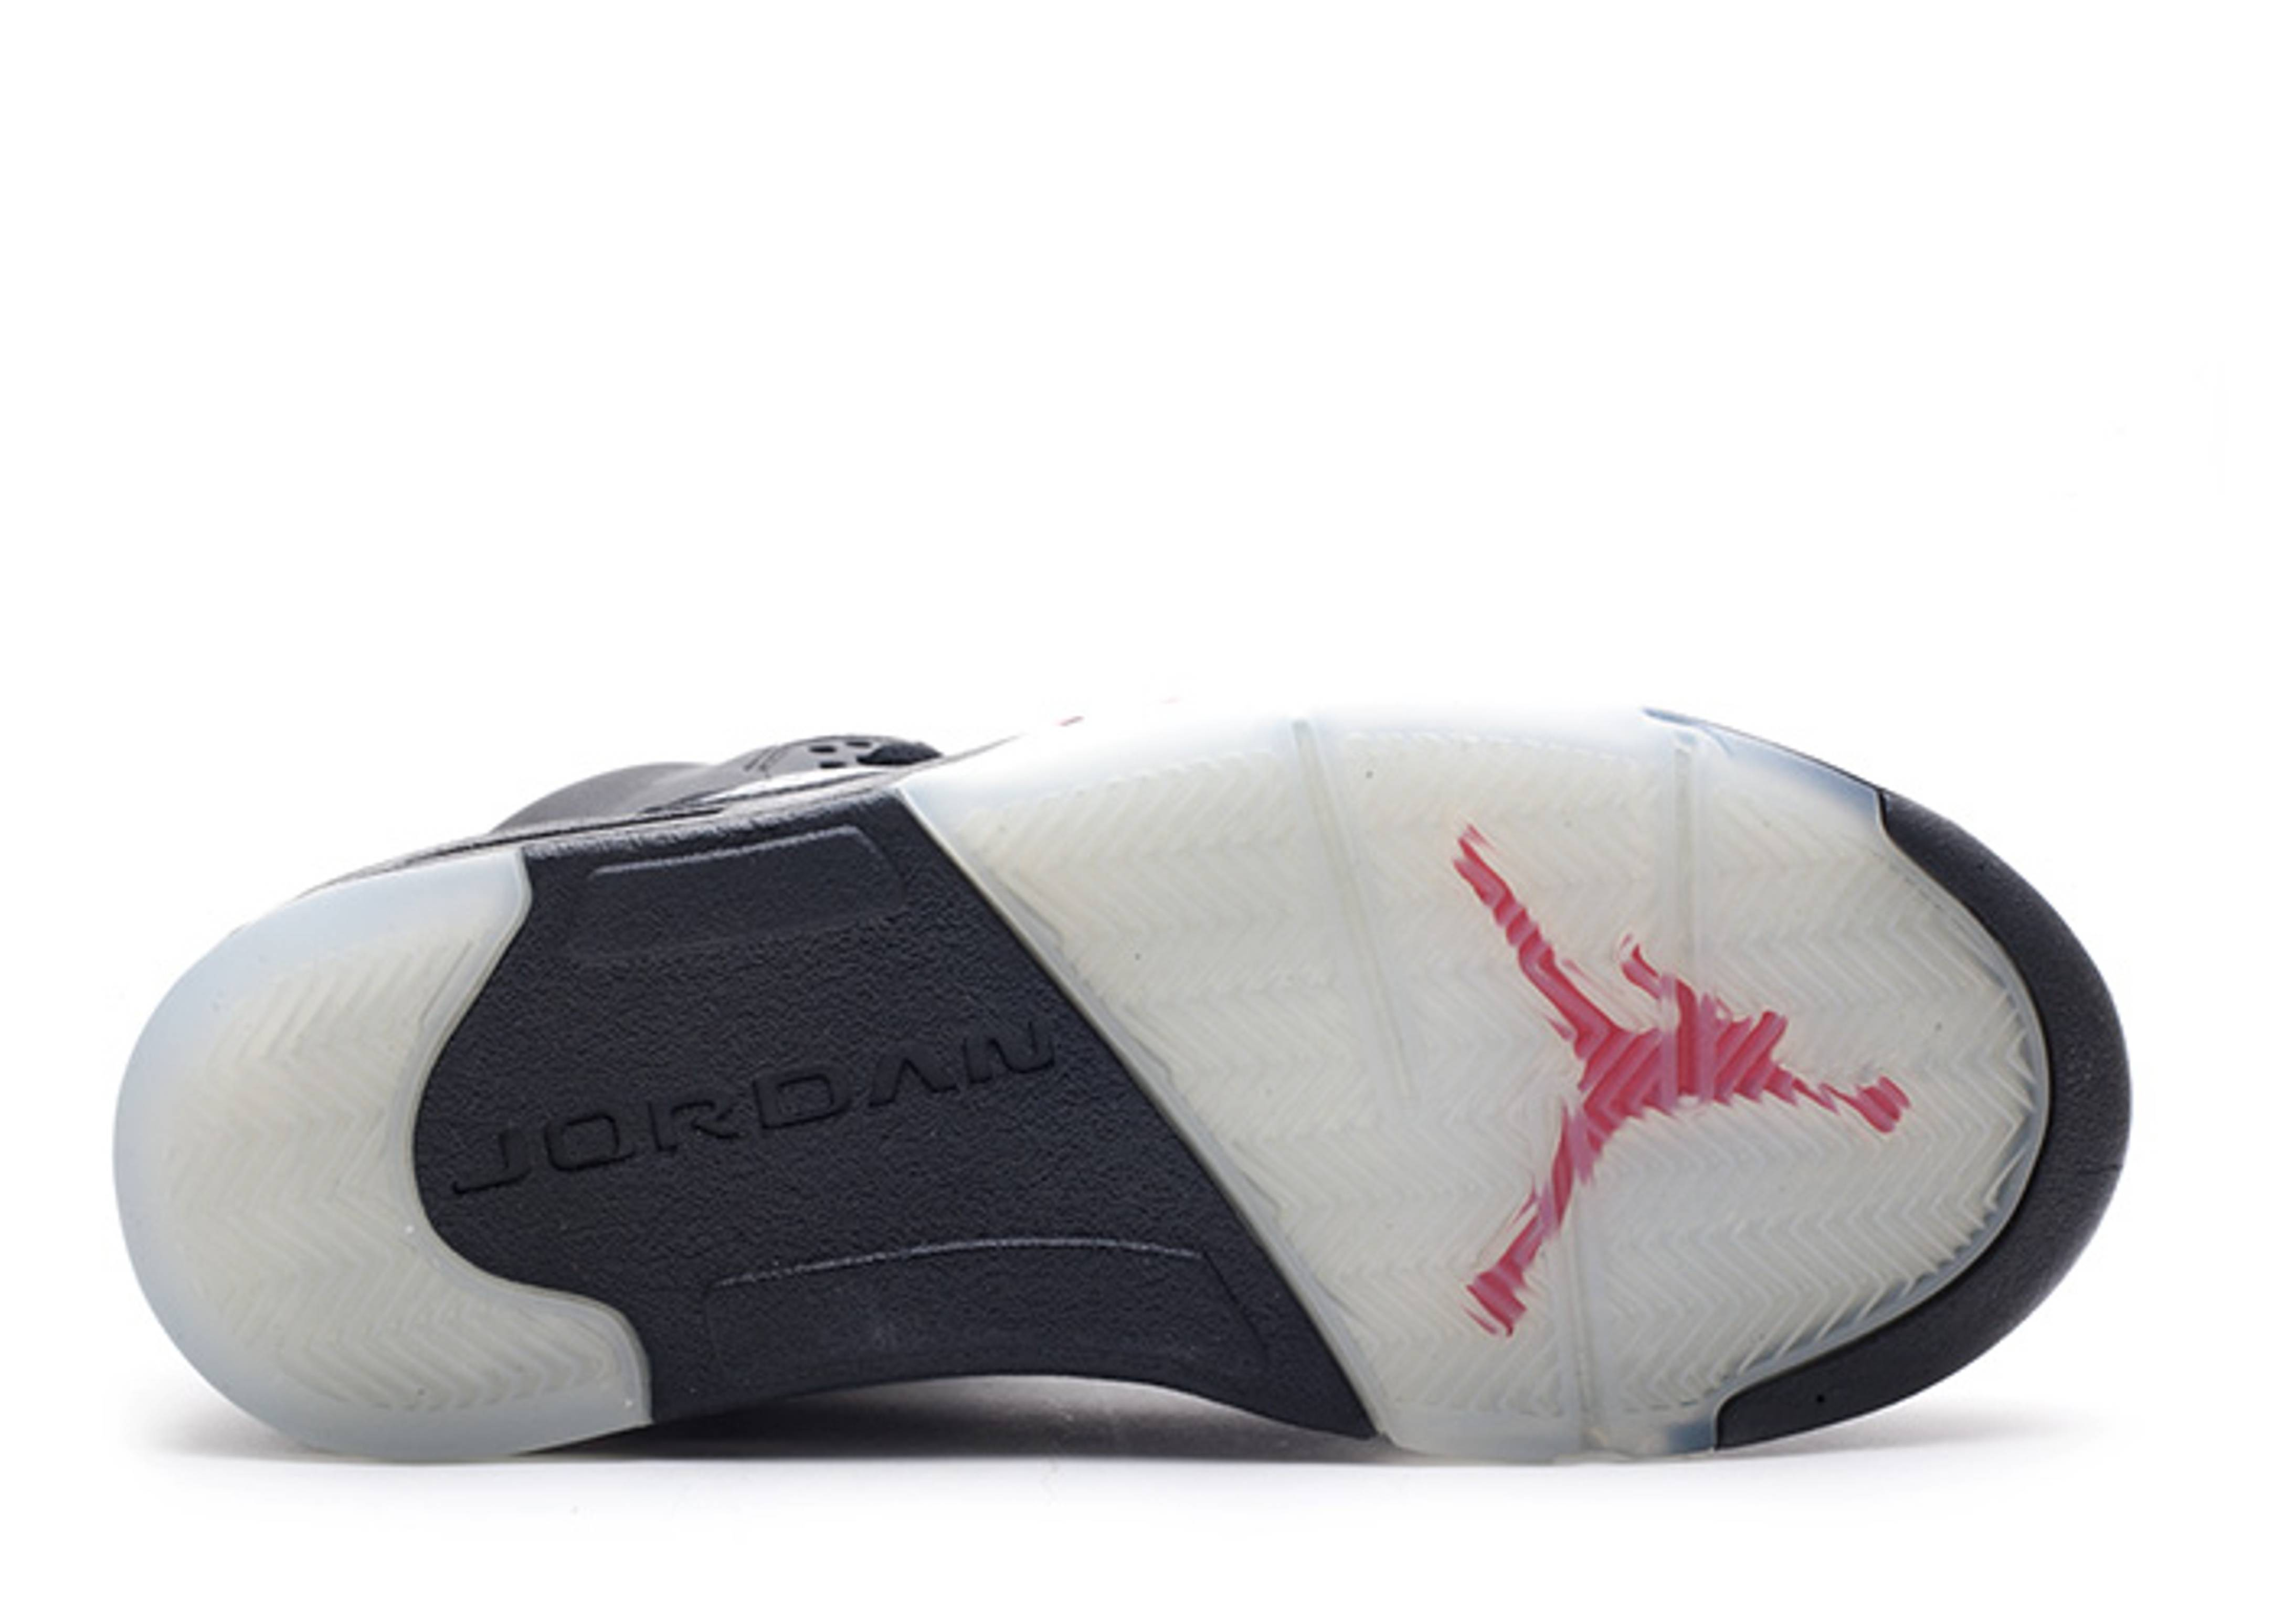 on sale ef683 3496f ... 136027-061 Air Jordan V (5) - Raging Bull Pack - black  varsity red  air  jordan 5 retro ...